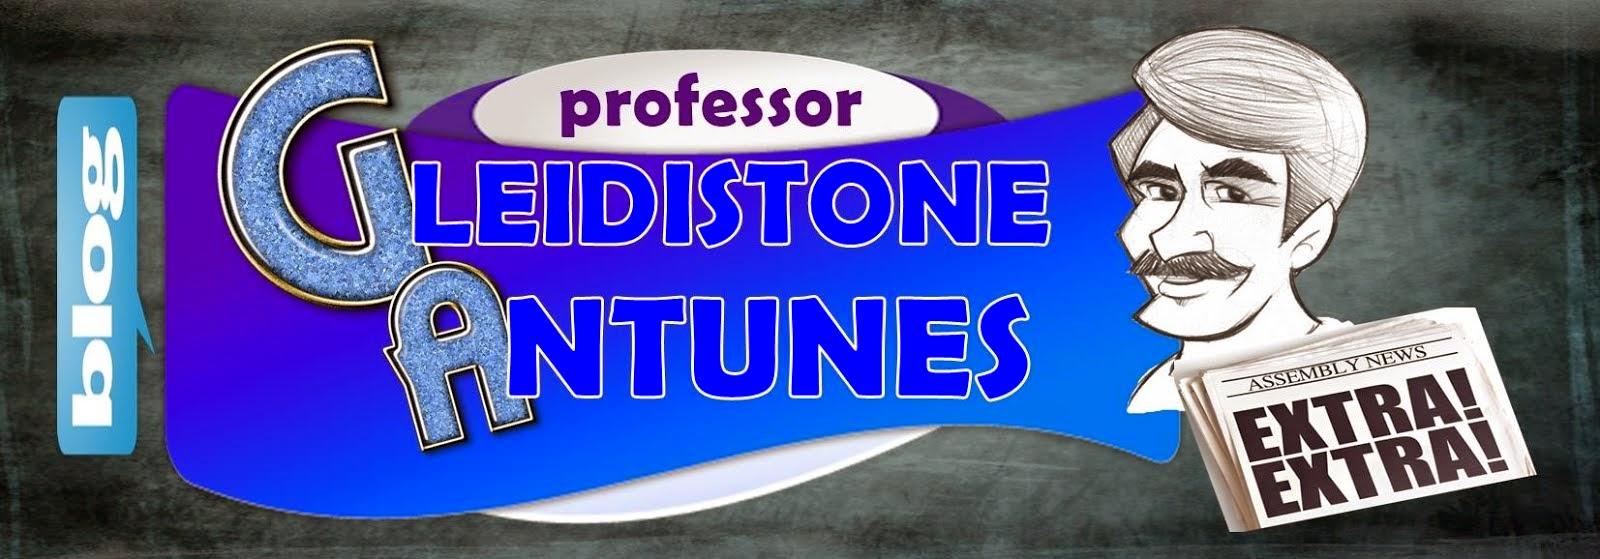 Prof_Gleidistone Antunes